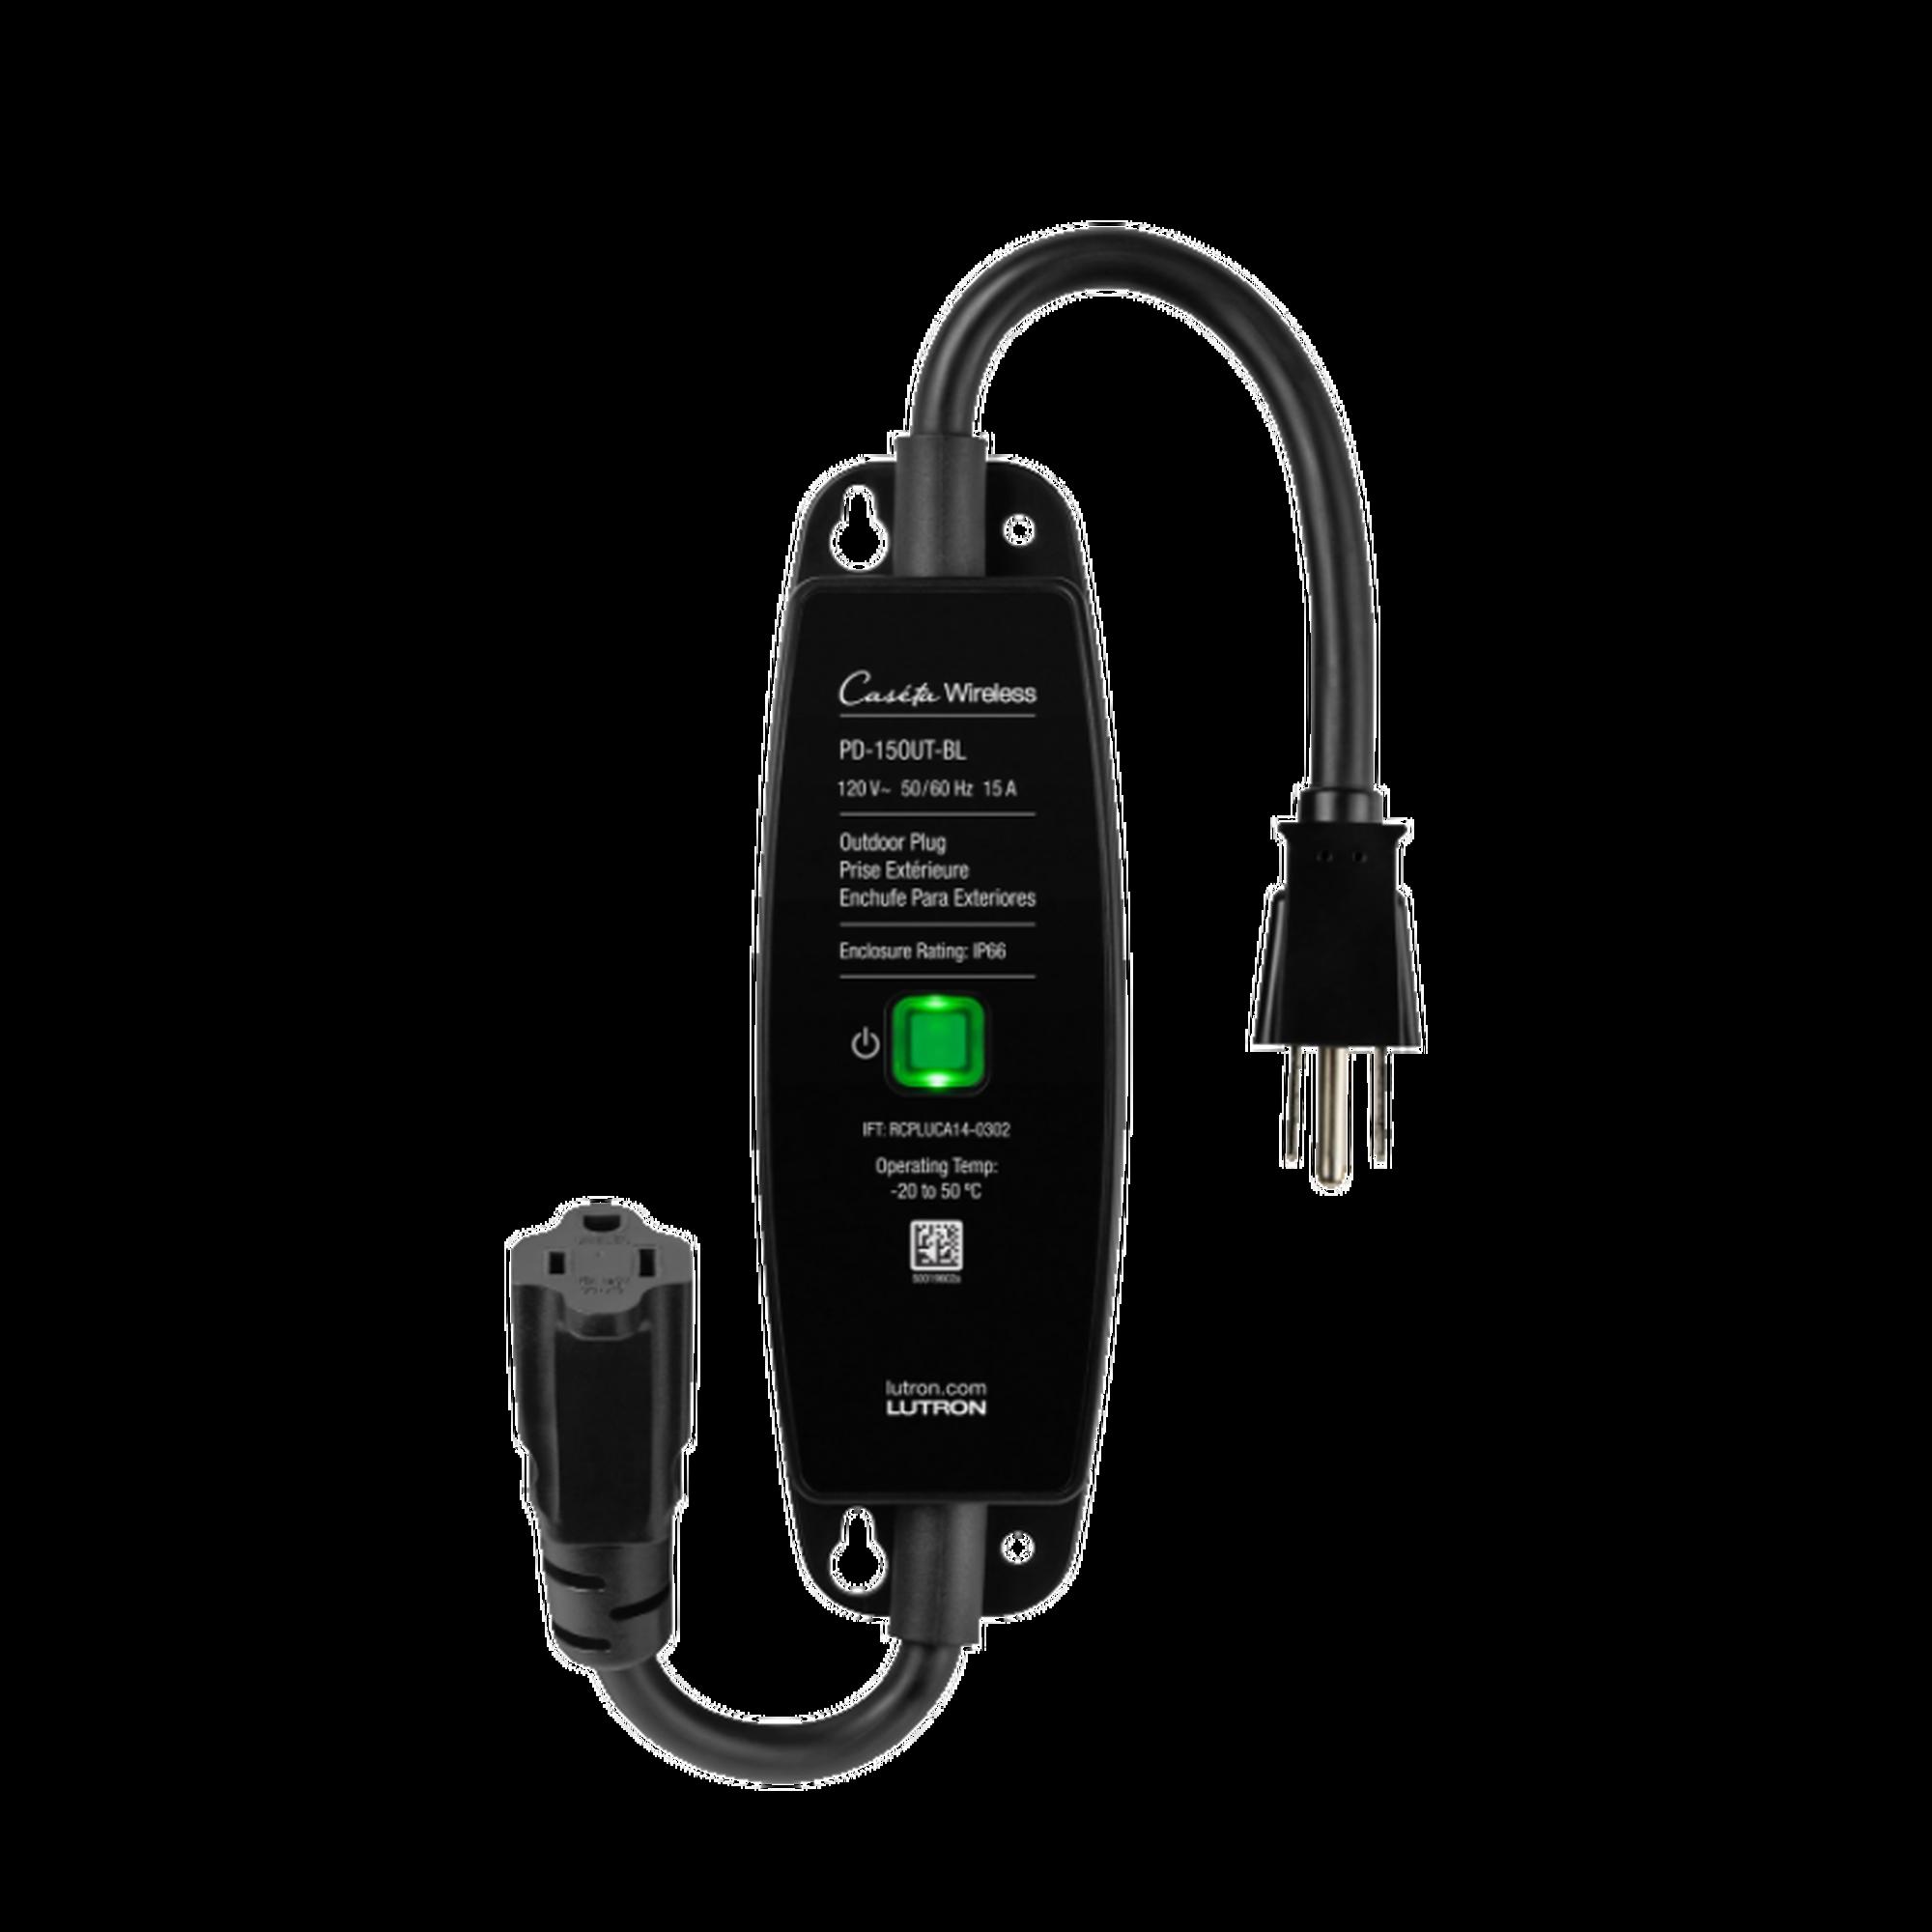 Plug para uso en exterior, inalambrico compatible con Caseta Wireless